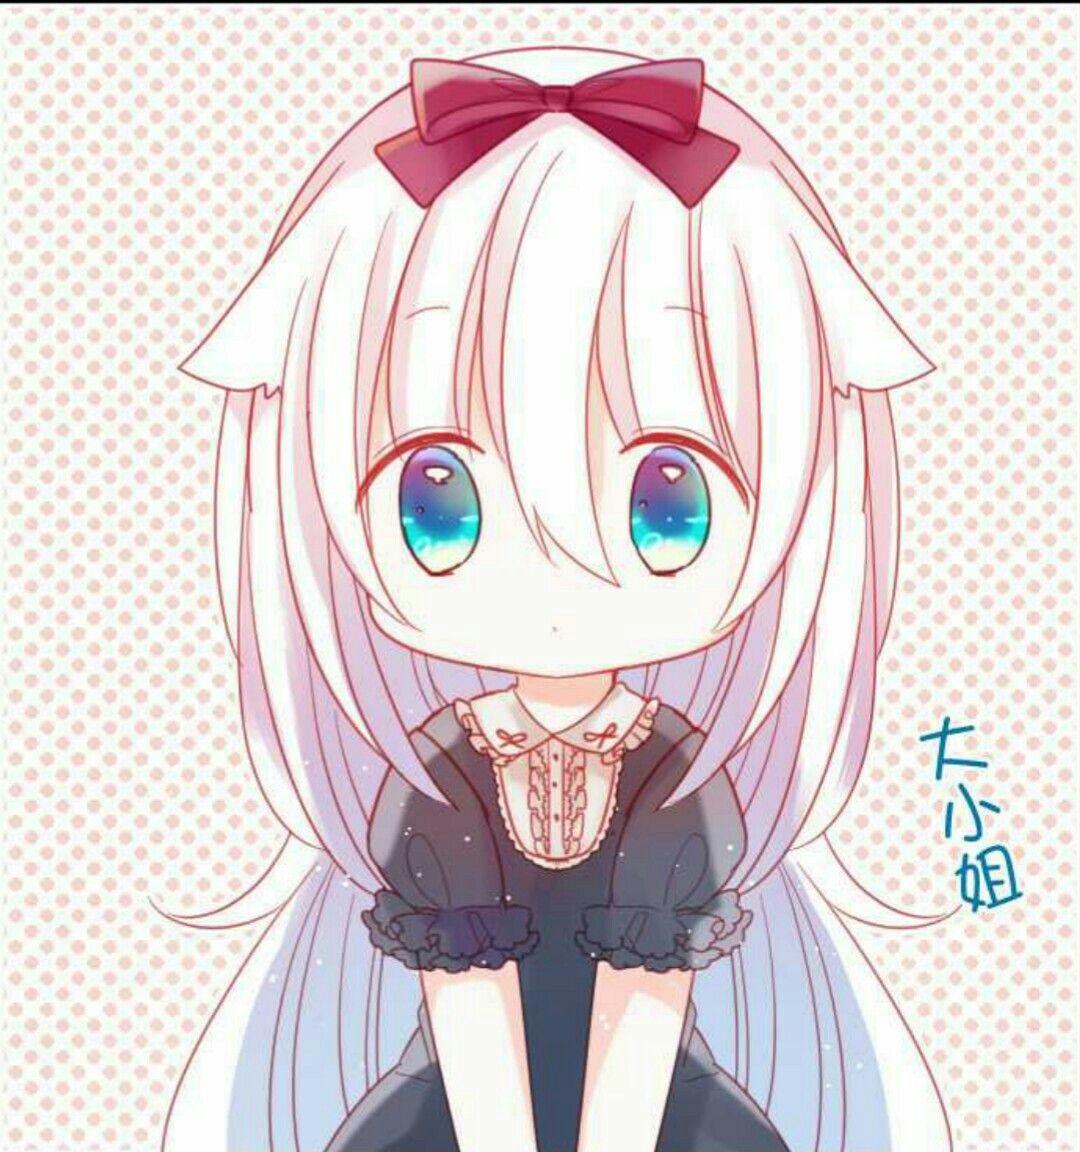 Pin De Kokone Furutaka Em Anime Girls Bebe Anime Desenhos Kawaii Olhos De Anime